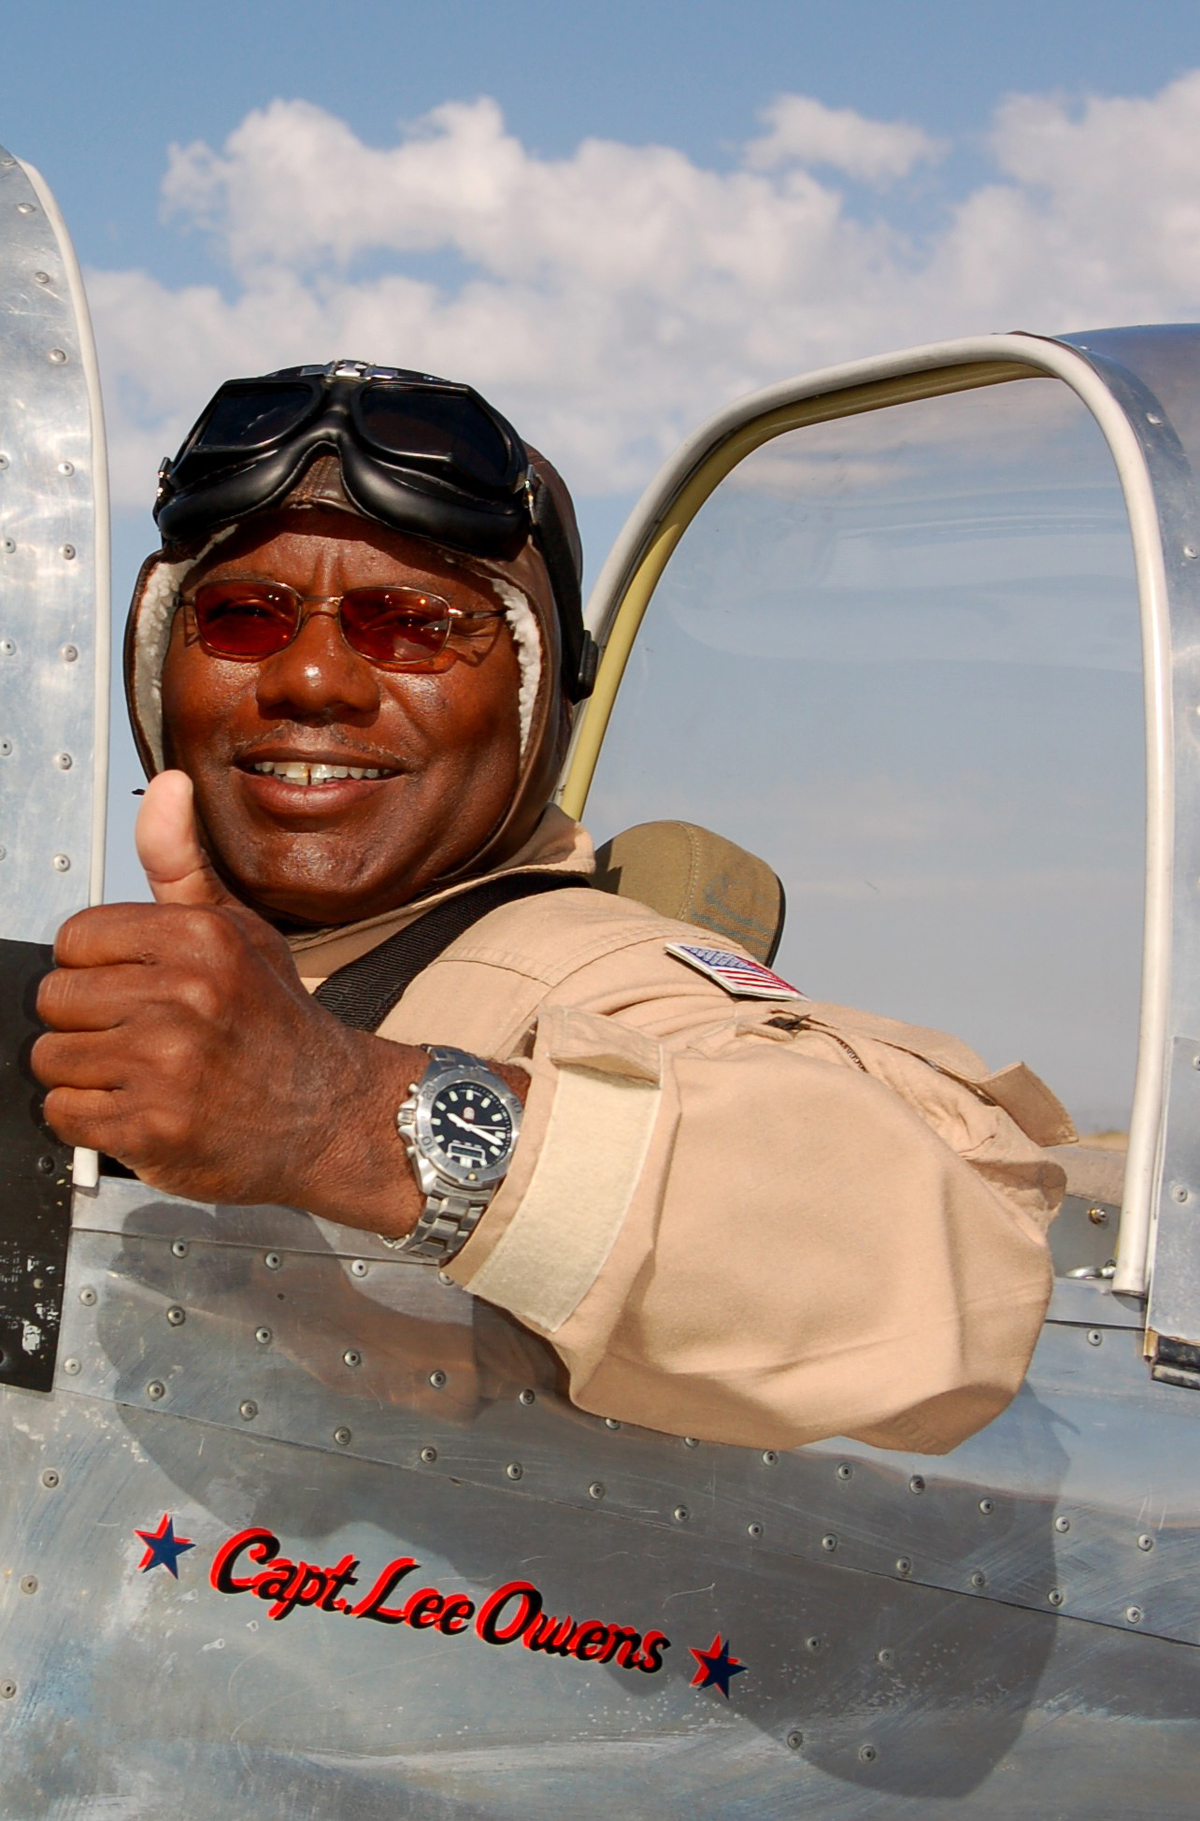 Black Aviator Poised to Circumnavigate the Globe